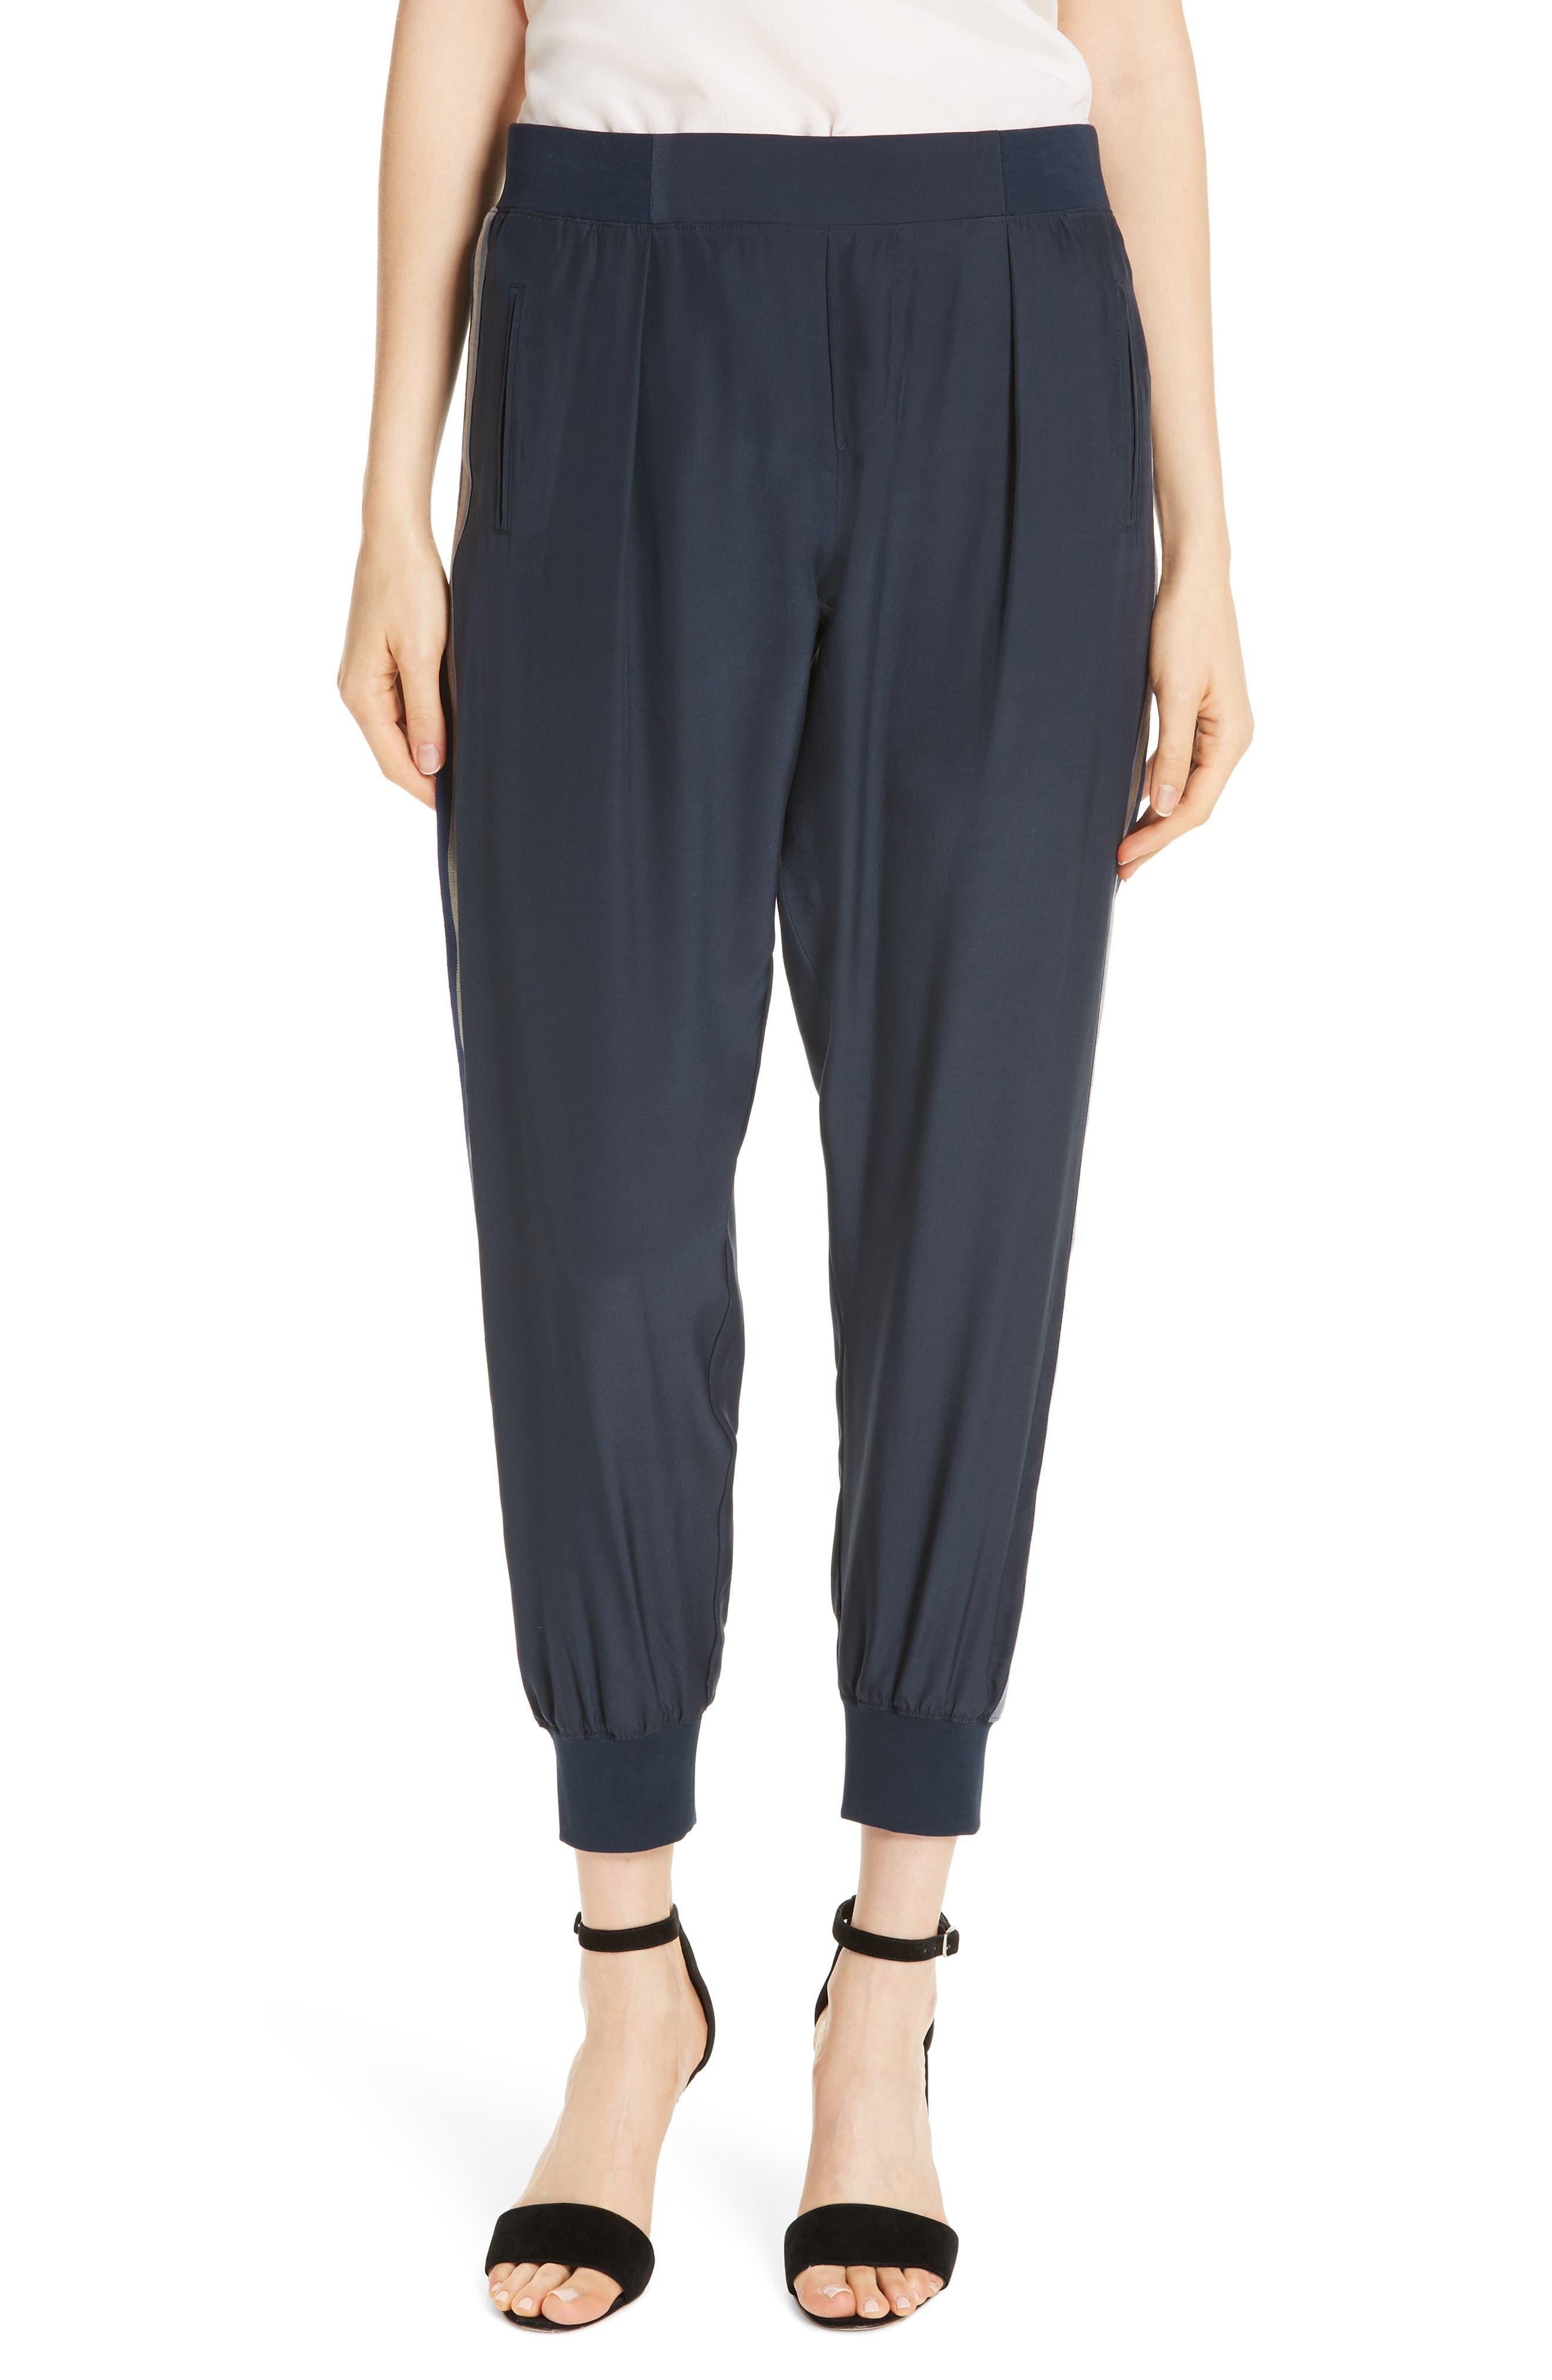 Striped Silk Satin Jogger Pants - Blue Size M